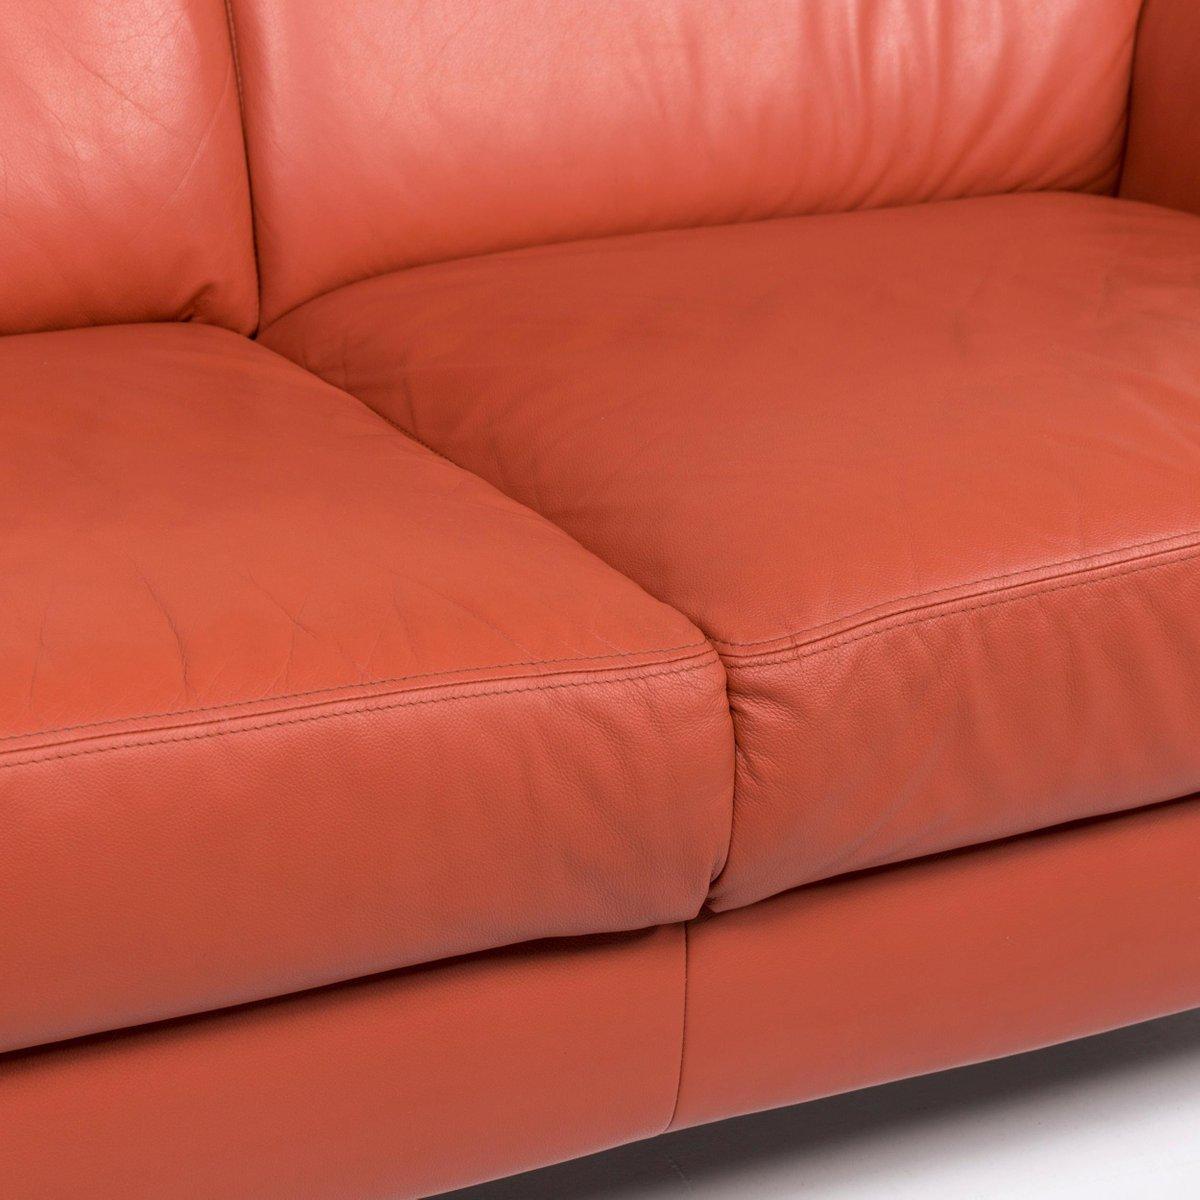 Ring Terracotta Leather 2 Seat Sofa